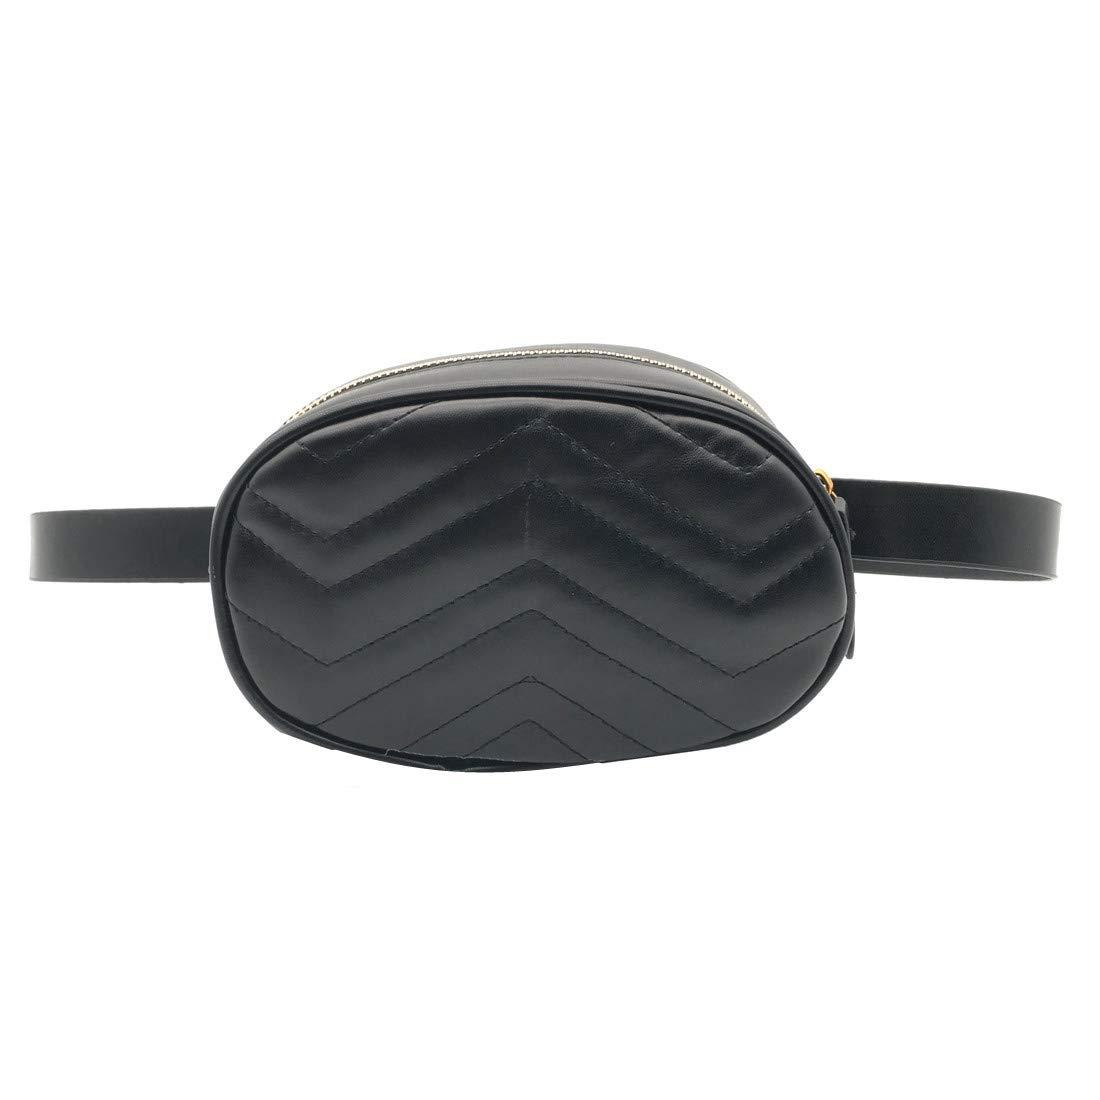 Fashion Belt Bag Waist Bag Round Women PU Leather Zipped Handbag 2018 Summer Hight Quality